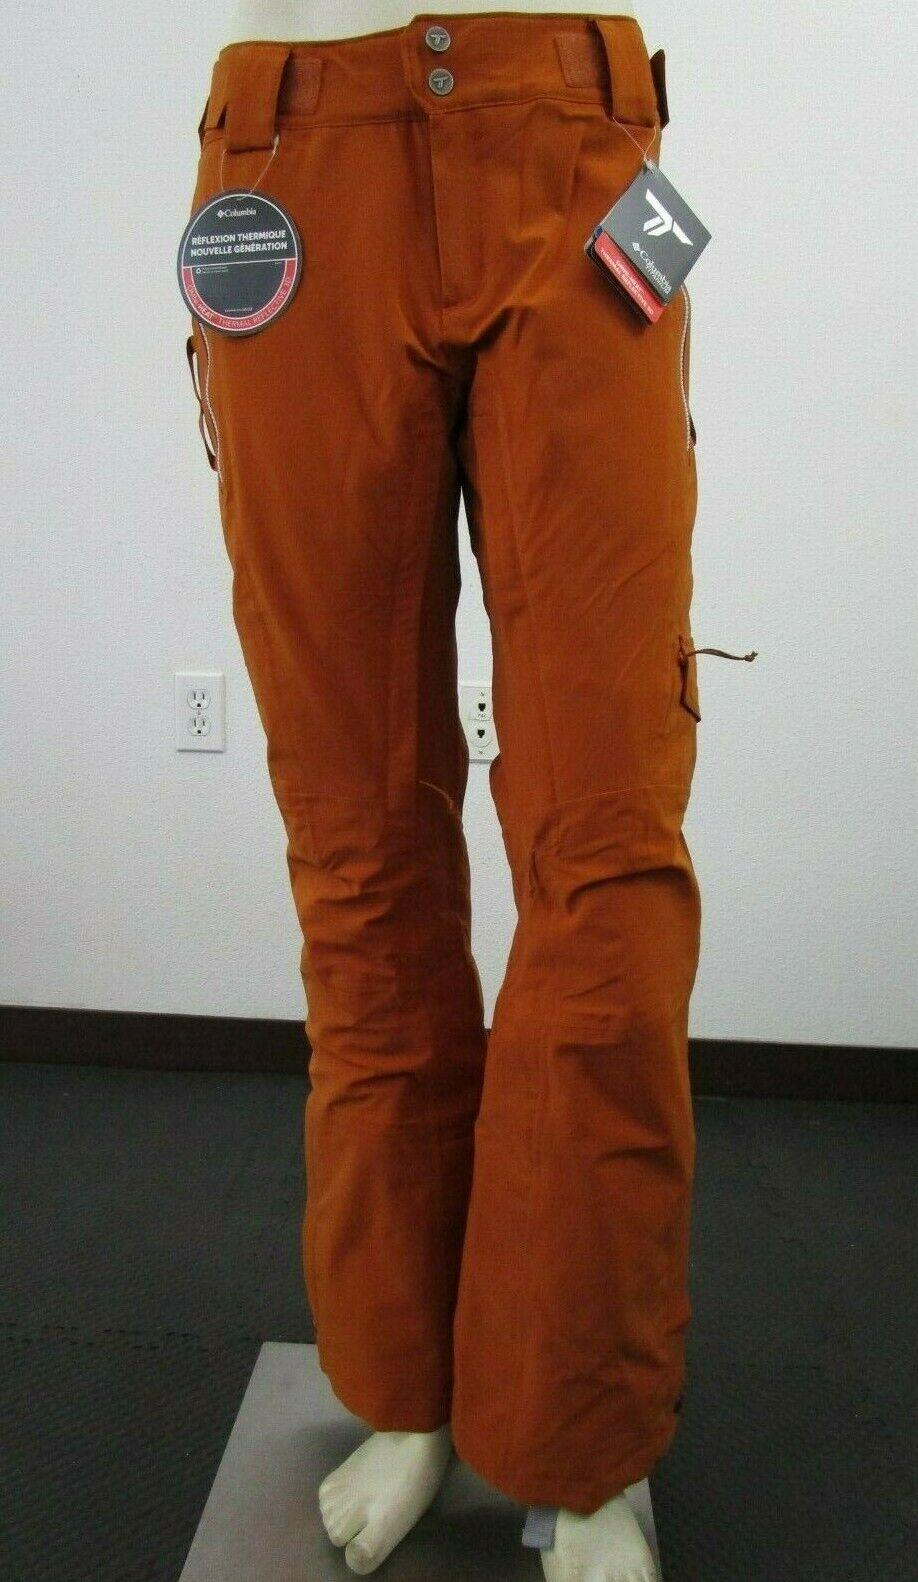 NWT damen Columbia Titanium Powder Keg II Waterproof Insulated Ski Pants Copper